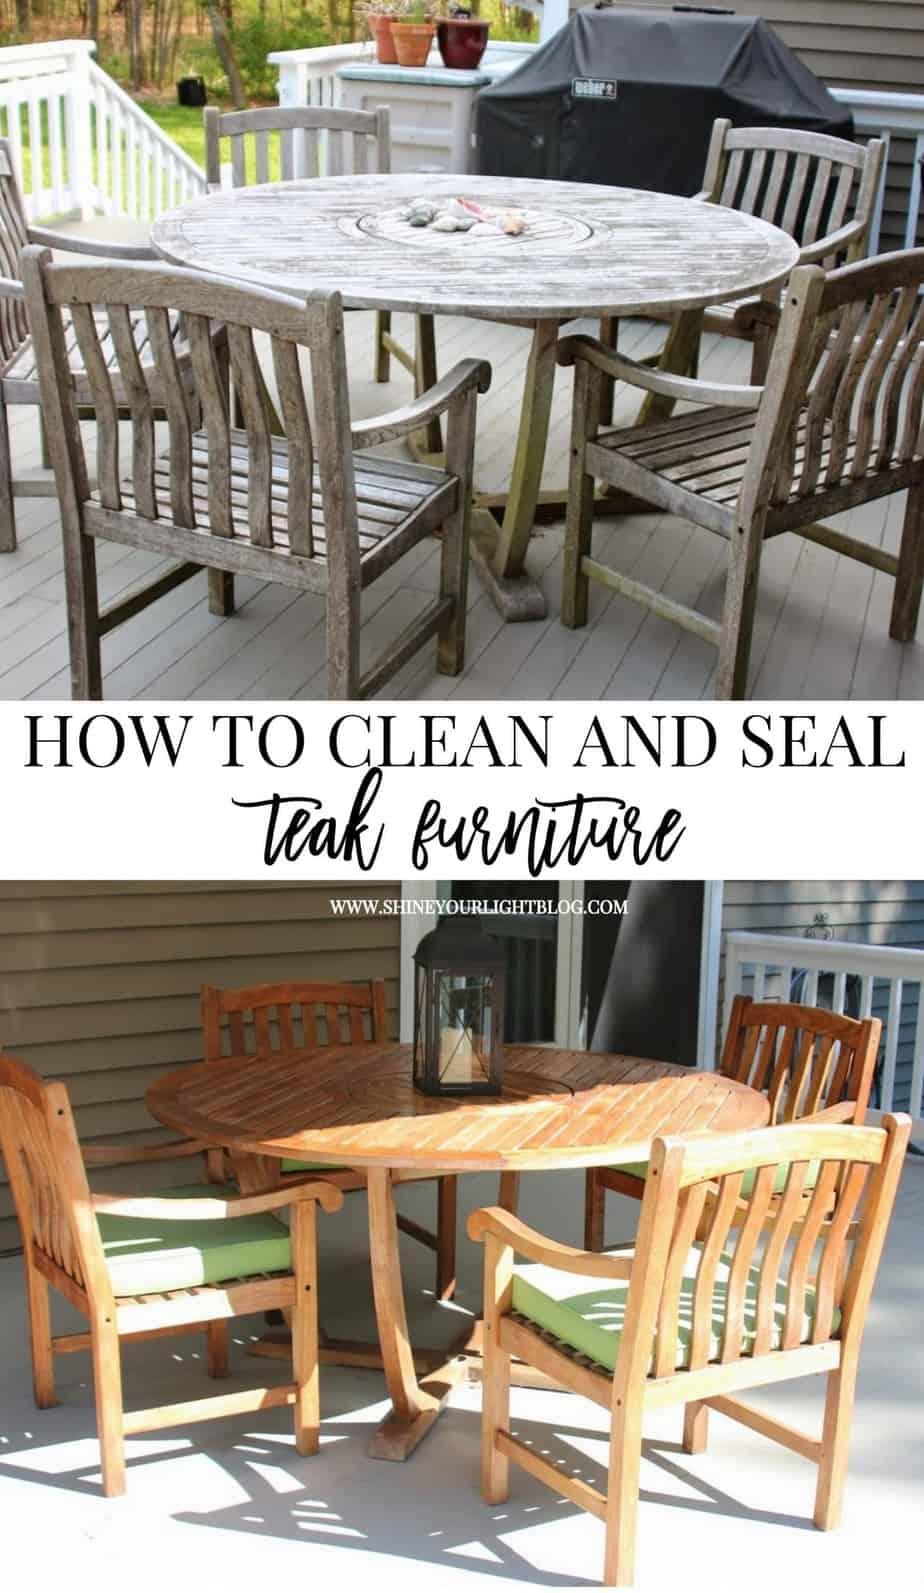 Cleaning Amp Sealing Outdoor Teak Furniture Shine Your Light